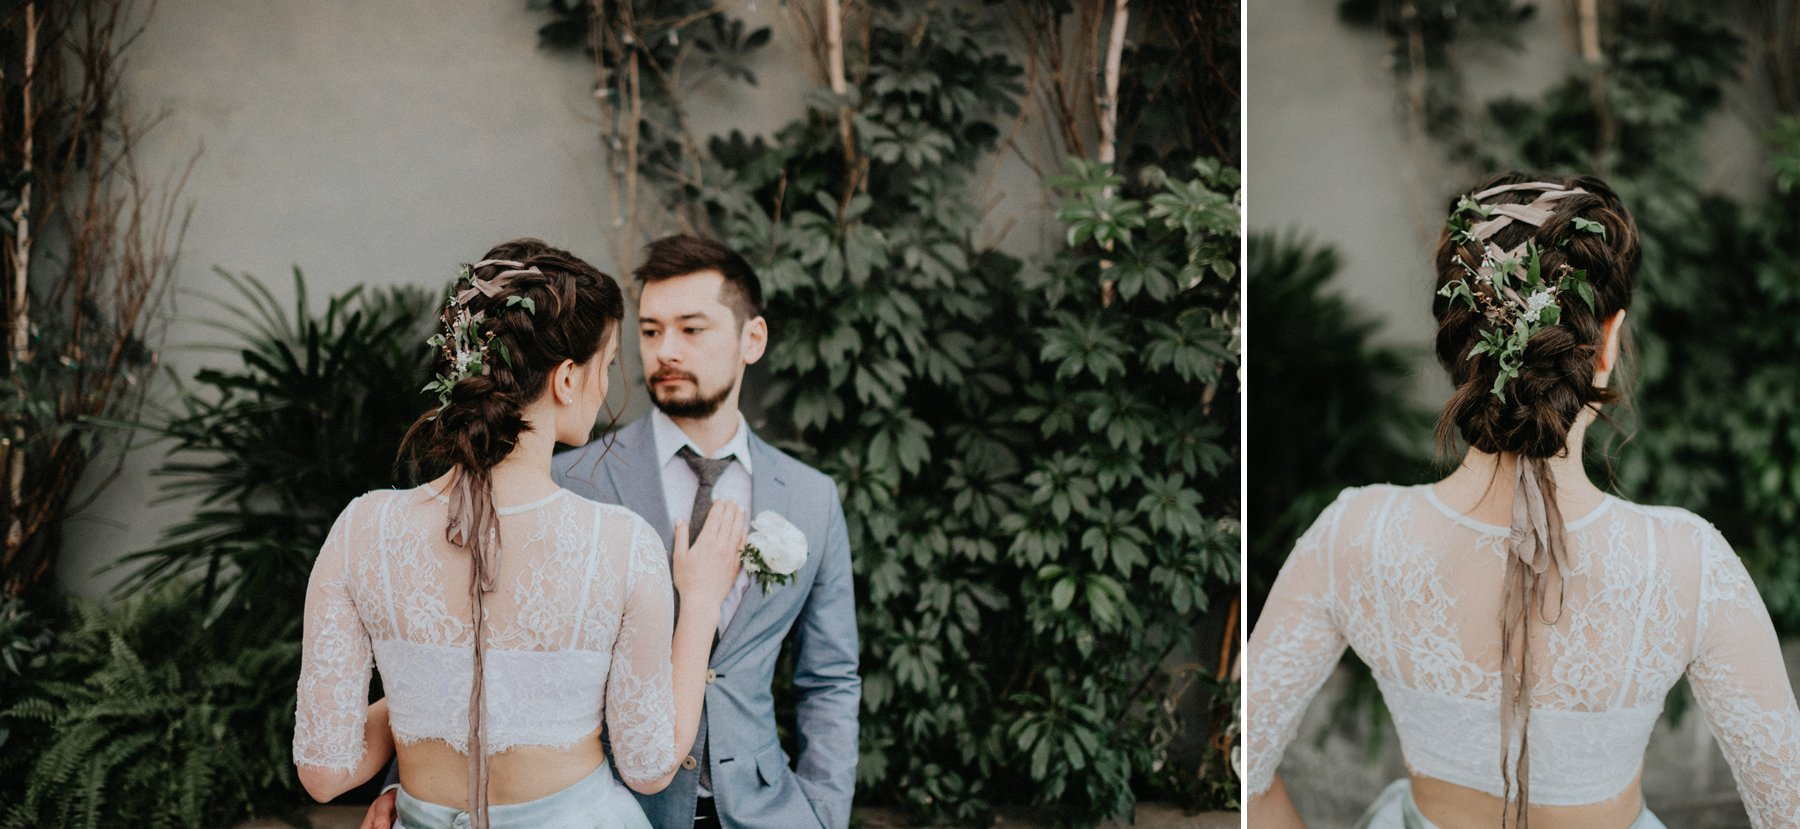 greenhouse-botanical-wedding-45.jpg